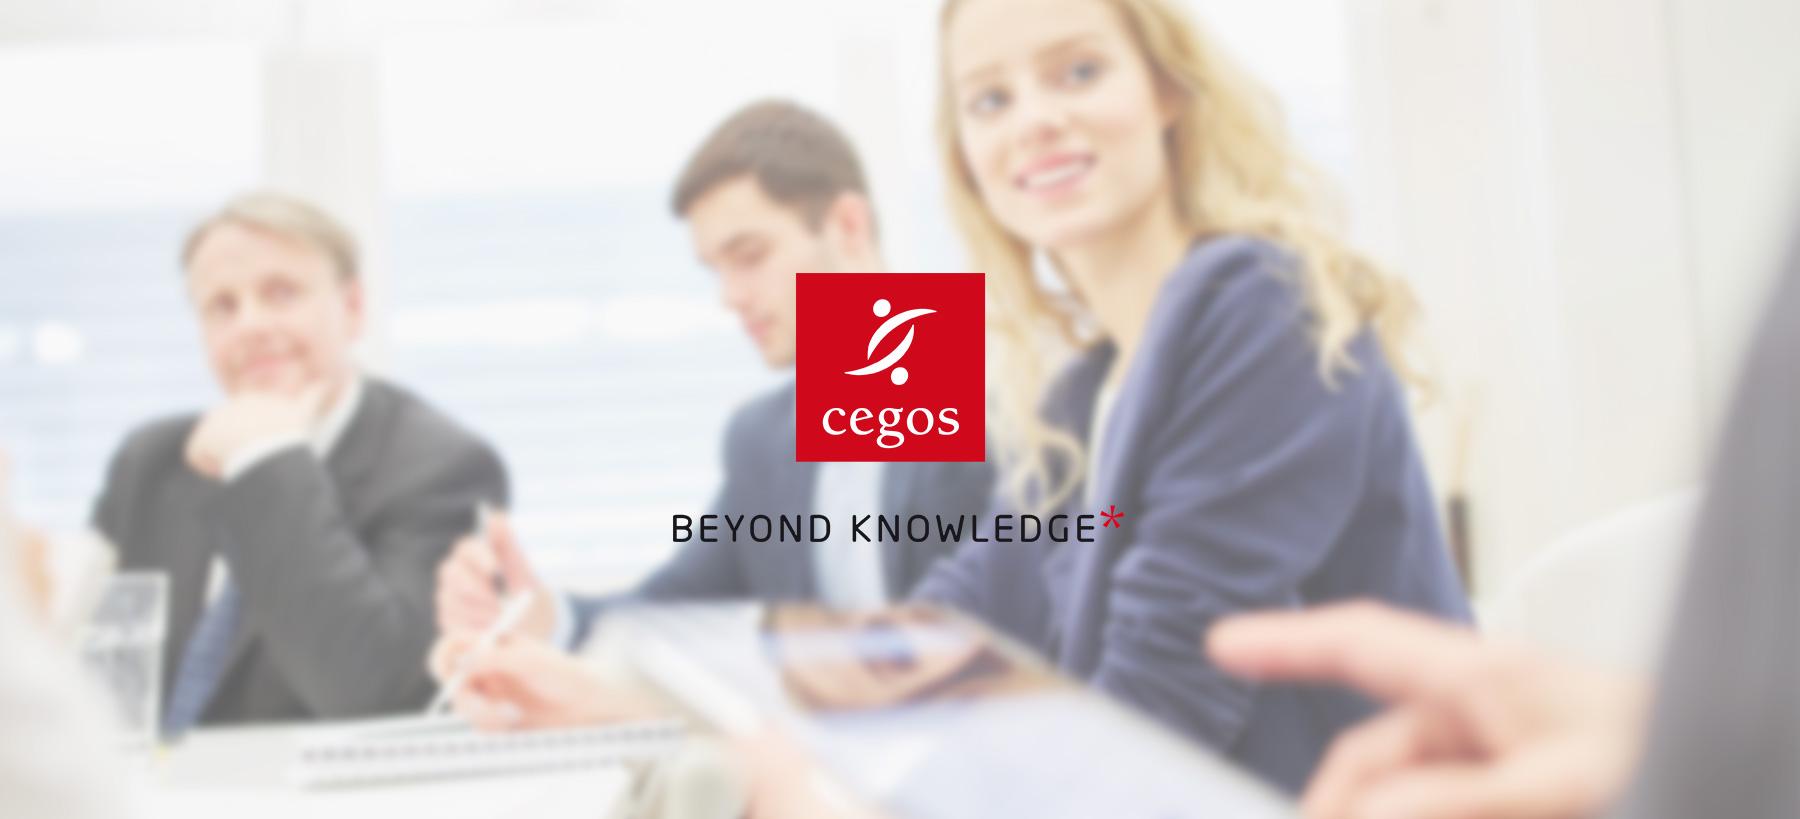 Directeur artistique freelance - CEGOS - Site internet